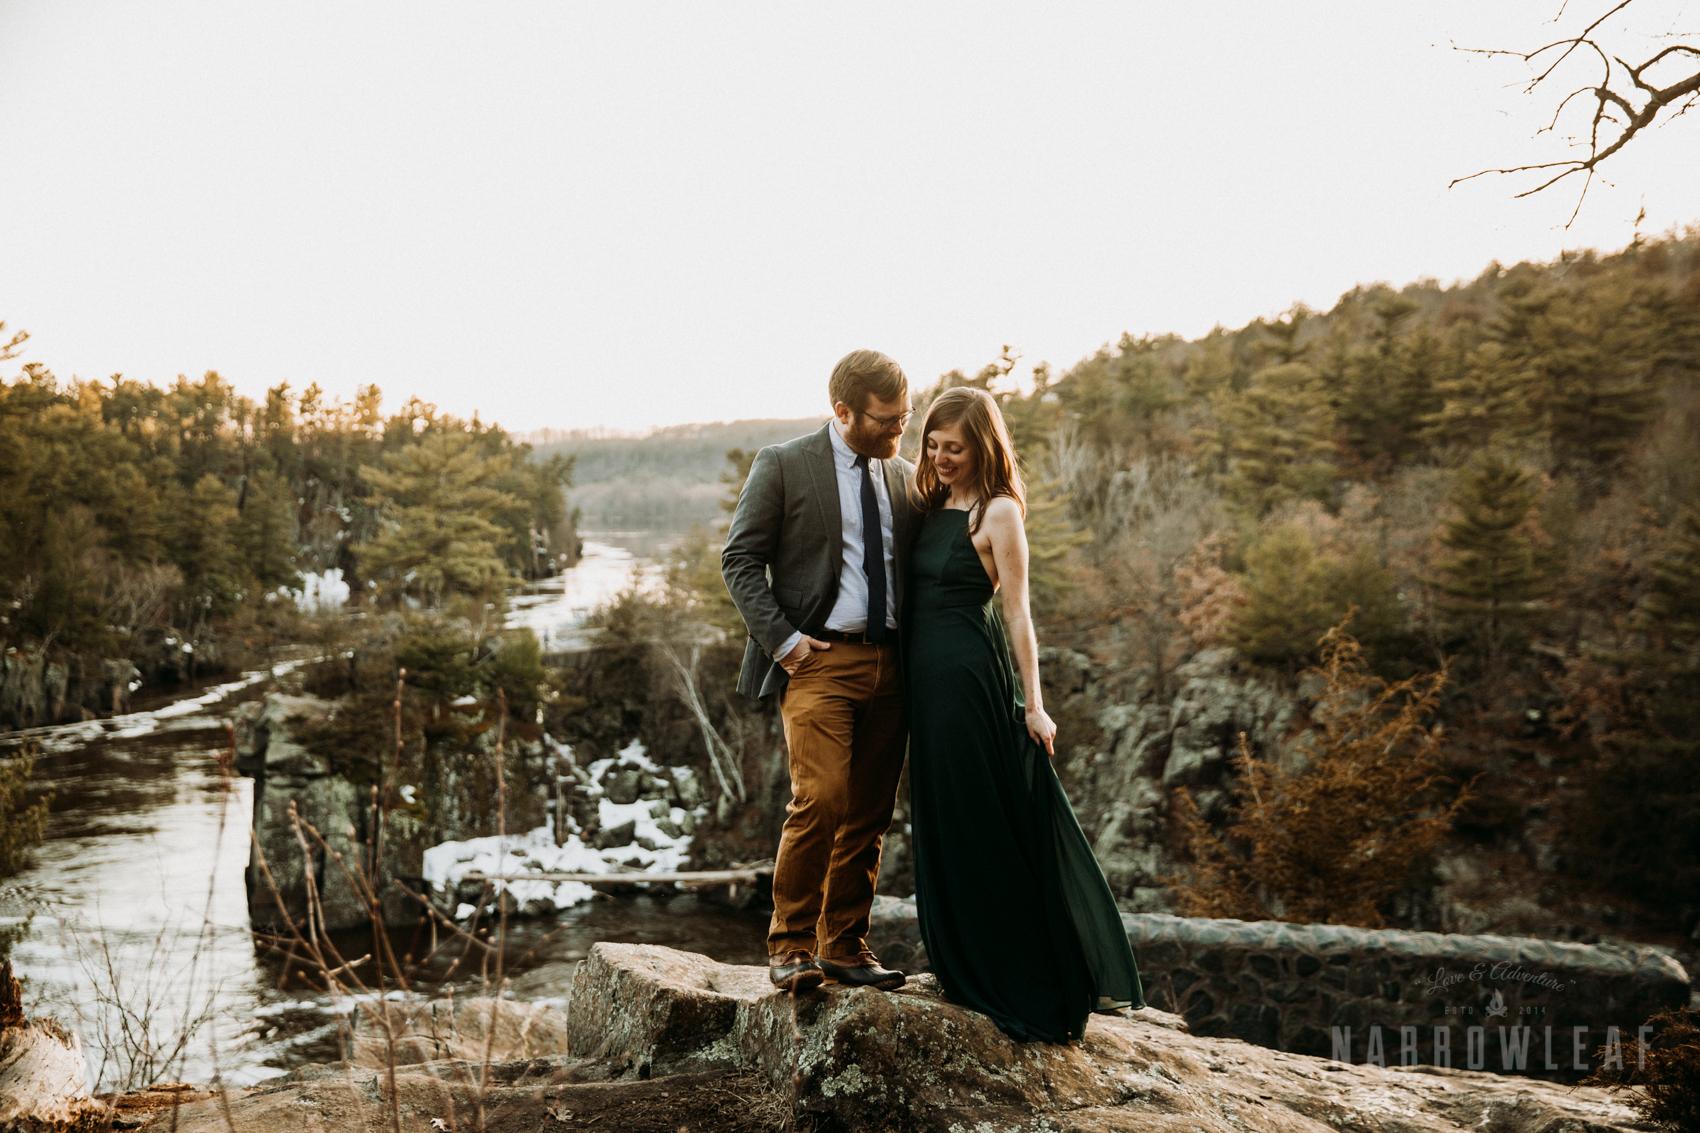 Spring-moody-wisconsin-woodsy-elopement-NarrowLeaf_Love_&_Adventure_Photography-9201.jpg